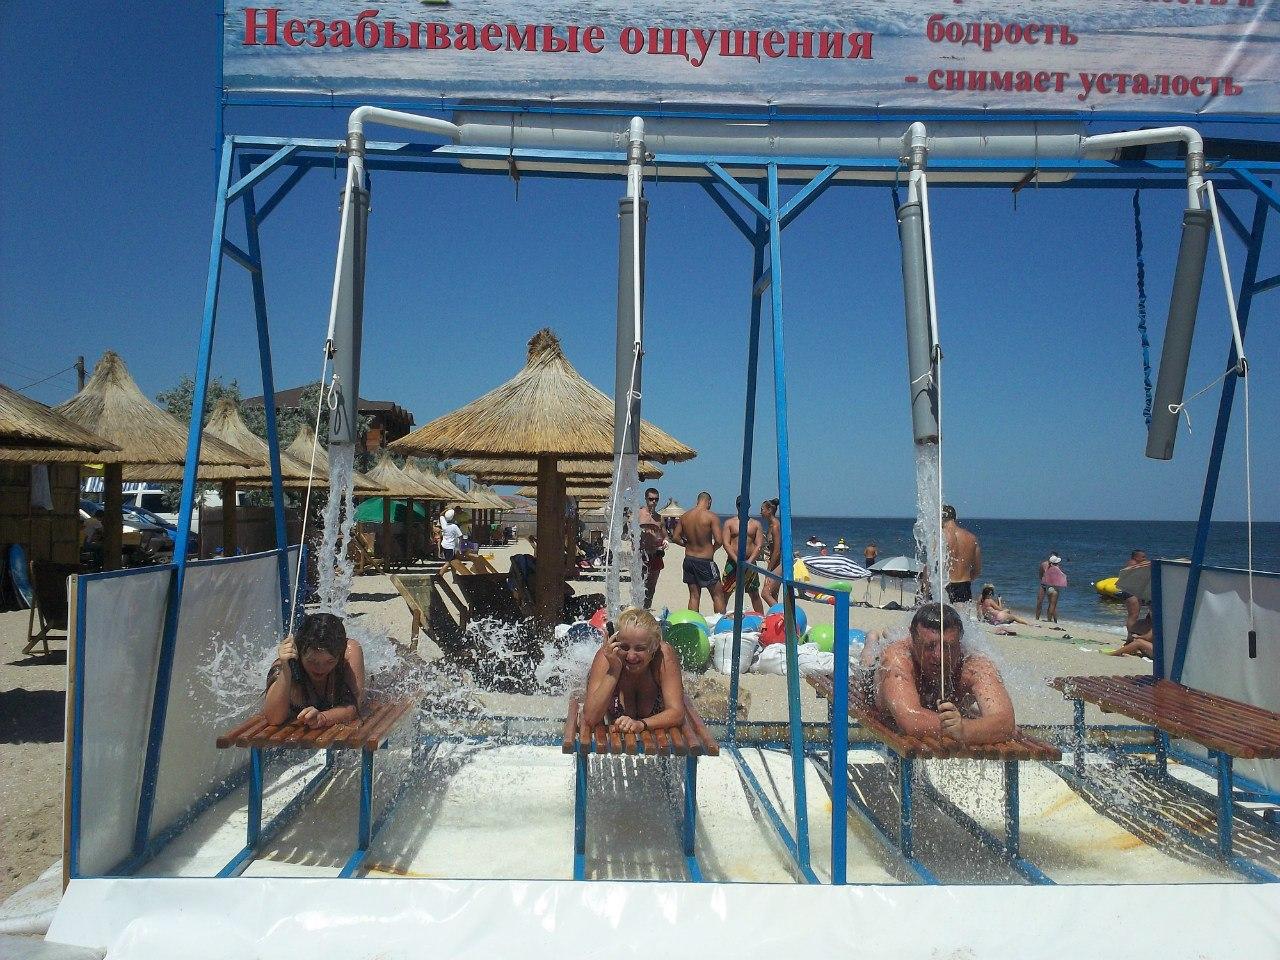 Азовское море. Бердянск. 2012 г. BfNrXOT-ZGQ